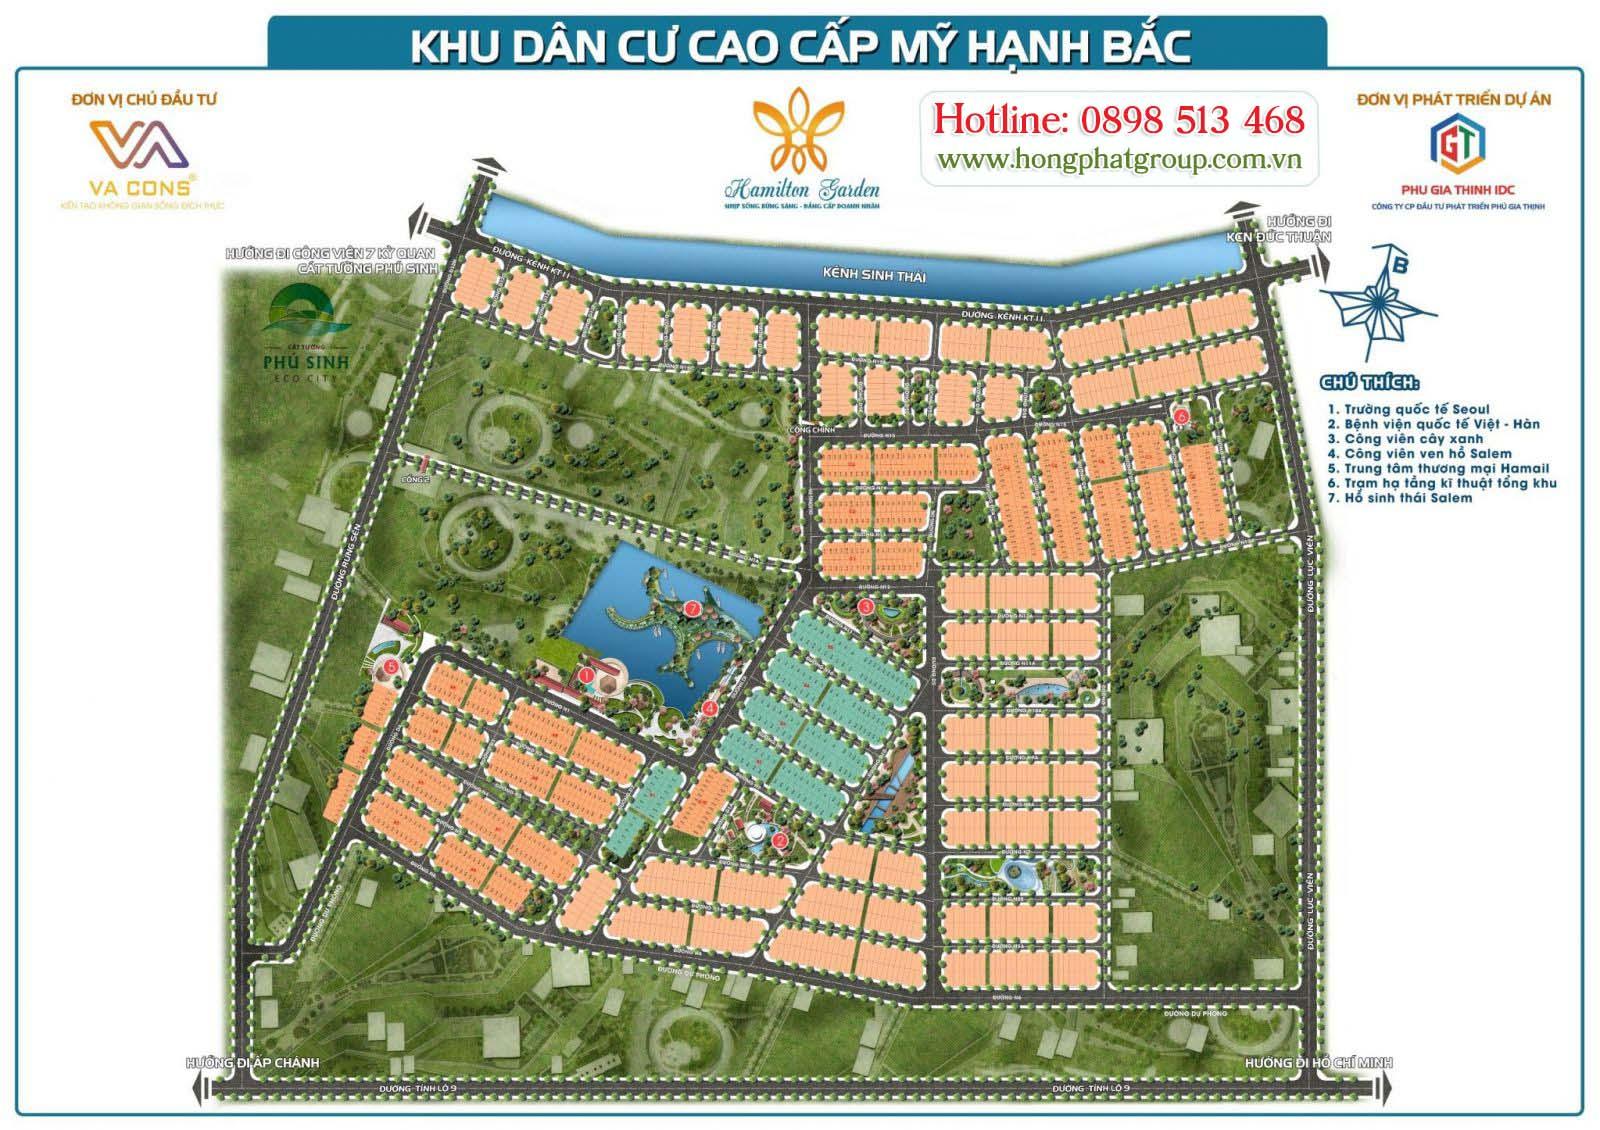 khu dan cu cao cap my hanh bac hamilton garden